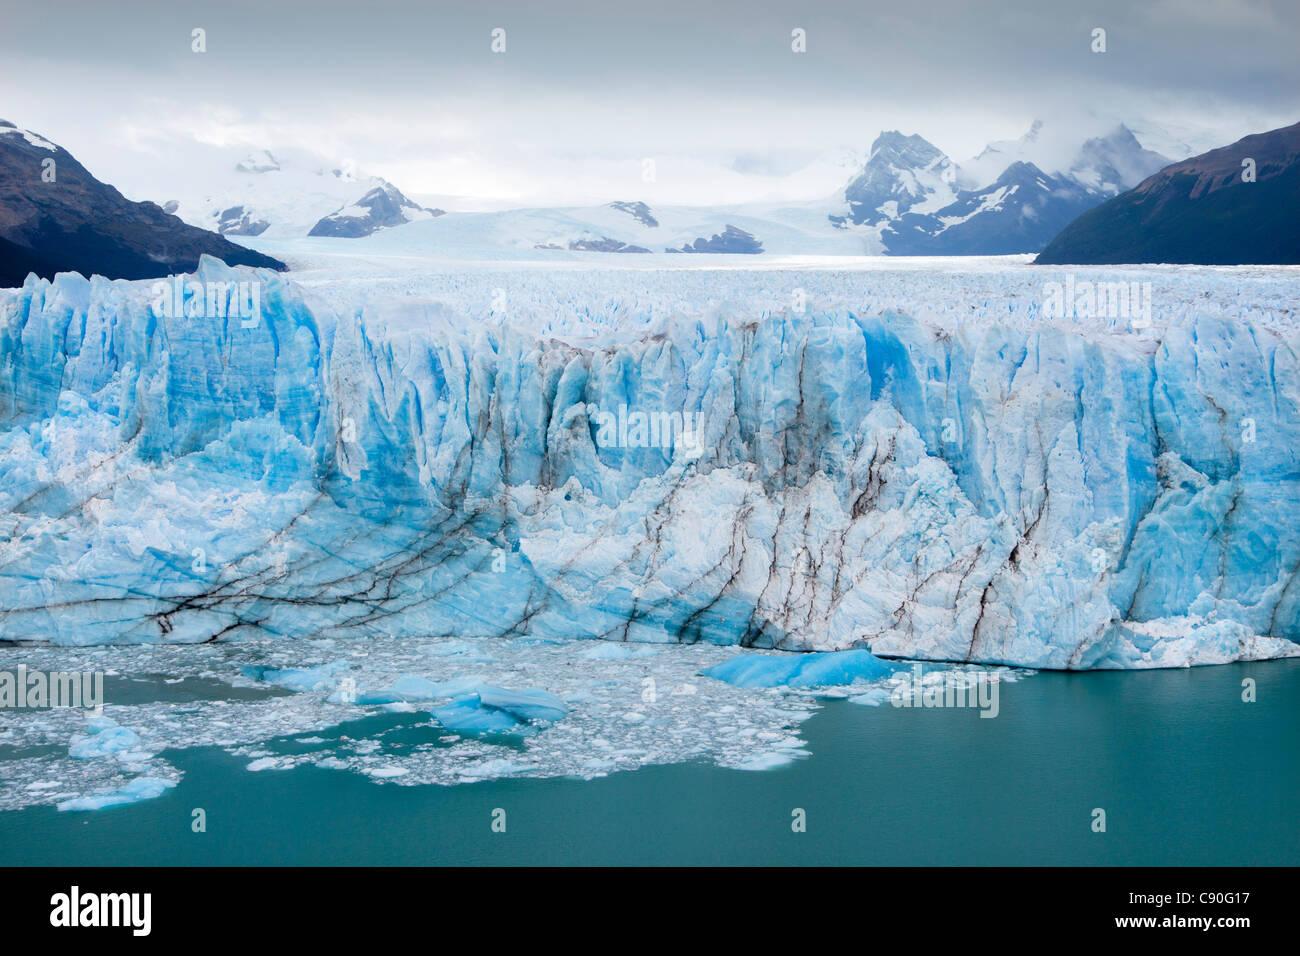 O glaciar Perito Moreno, Lago Argentino, Parque Nacional Los Glaciares, perto do El Calafate, Patagônia Argentina Imagens de Stock